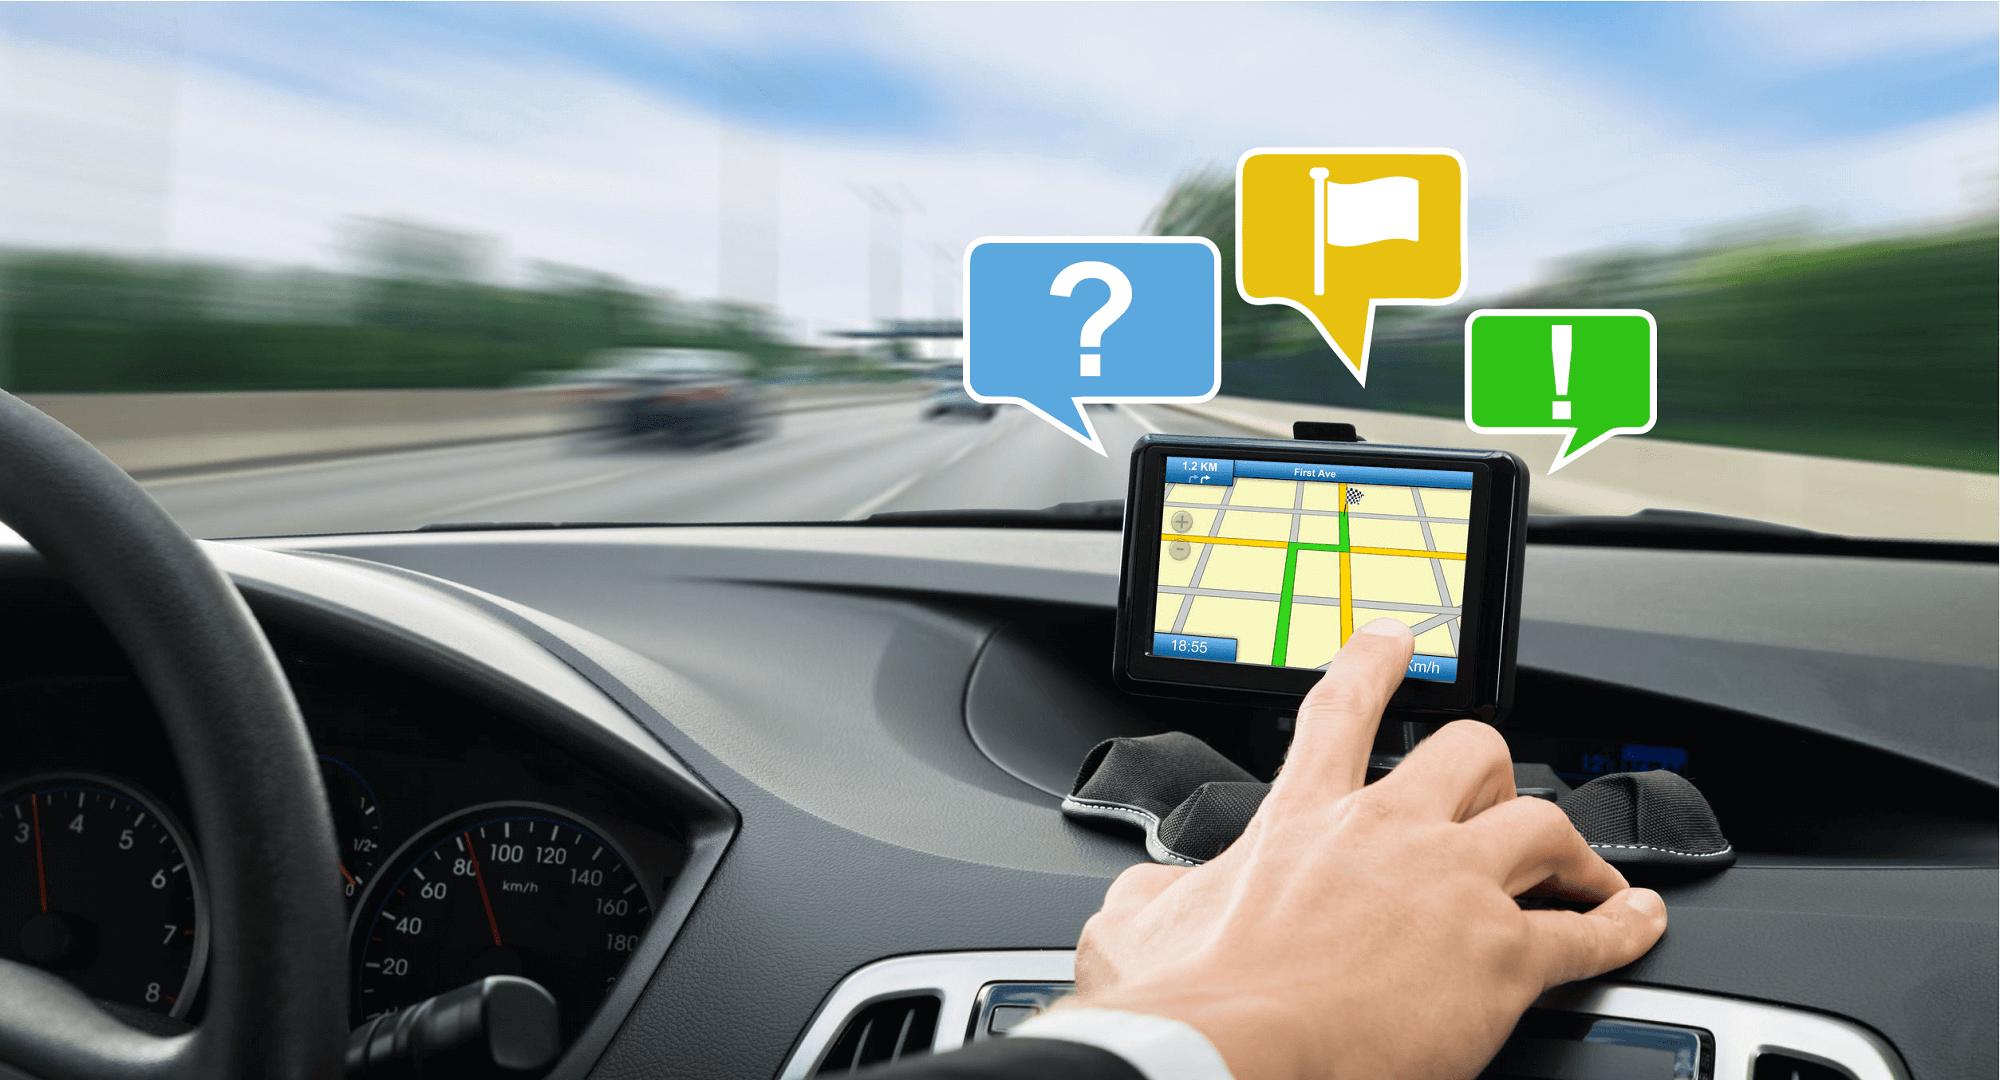 Интеграция с навигаторами Garmin